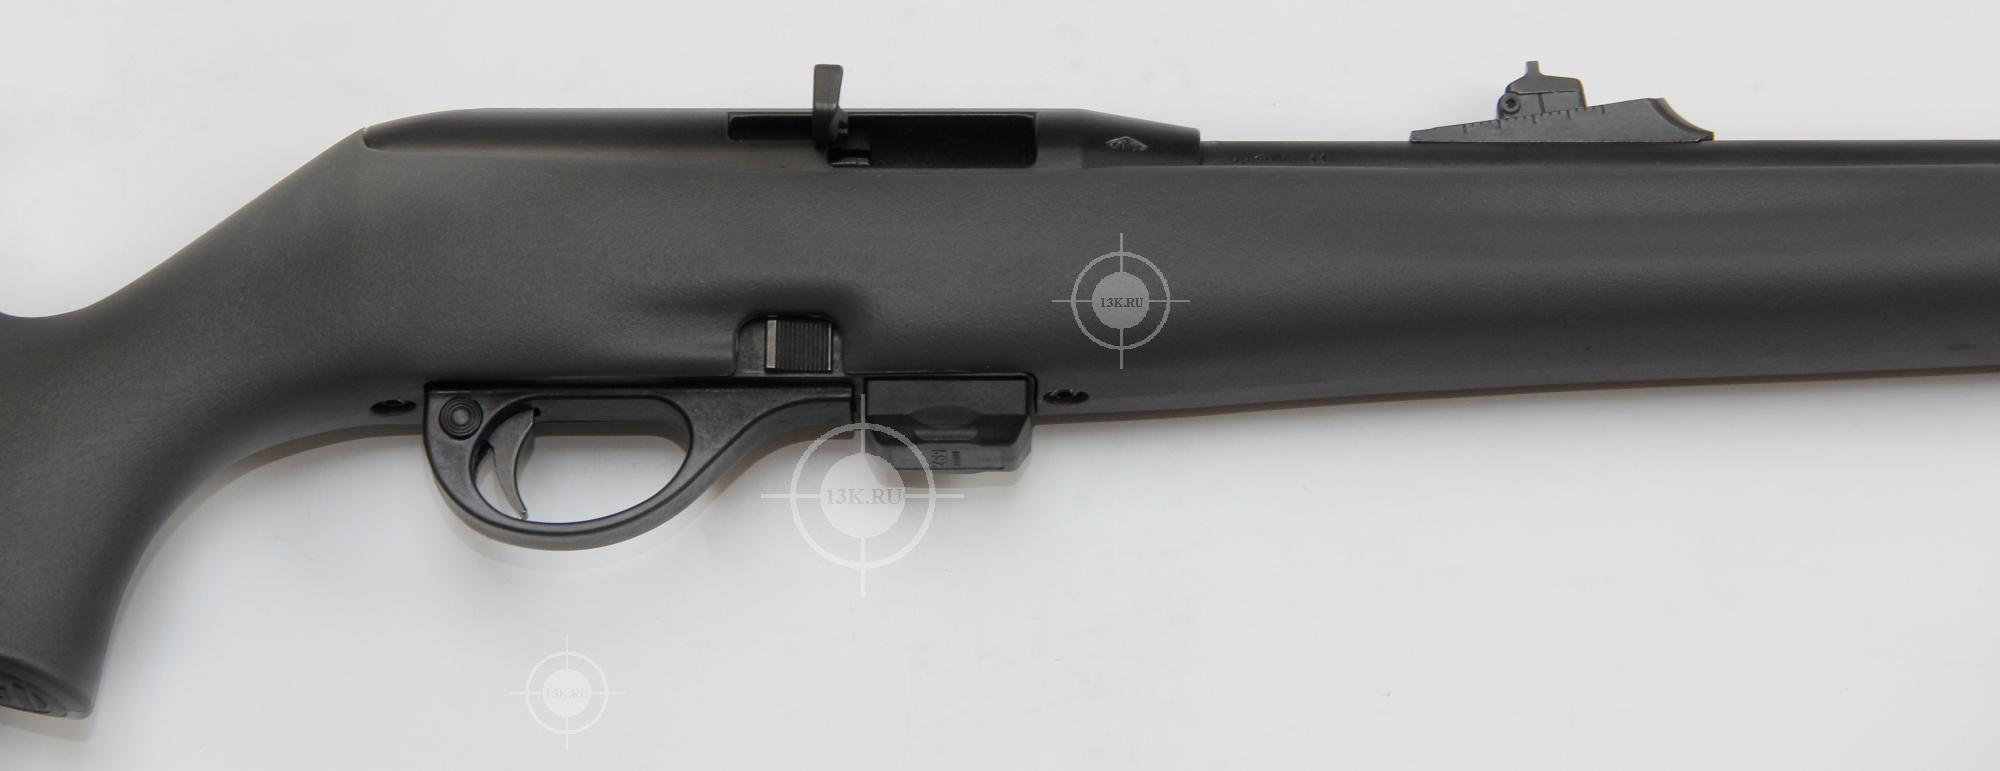 Remington 597 кал 22 lr пластик ствол 510 мм